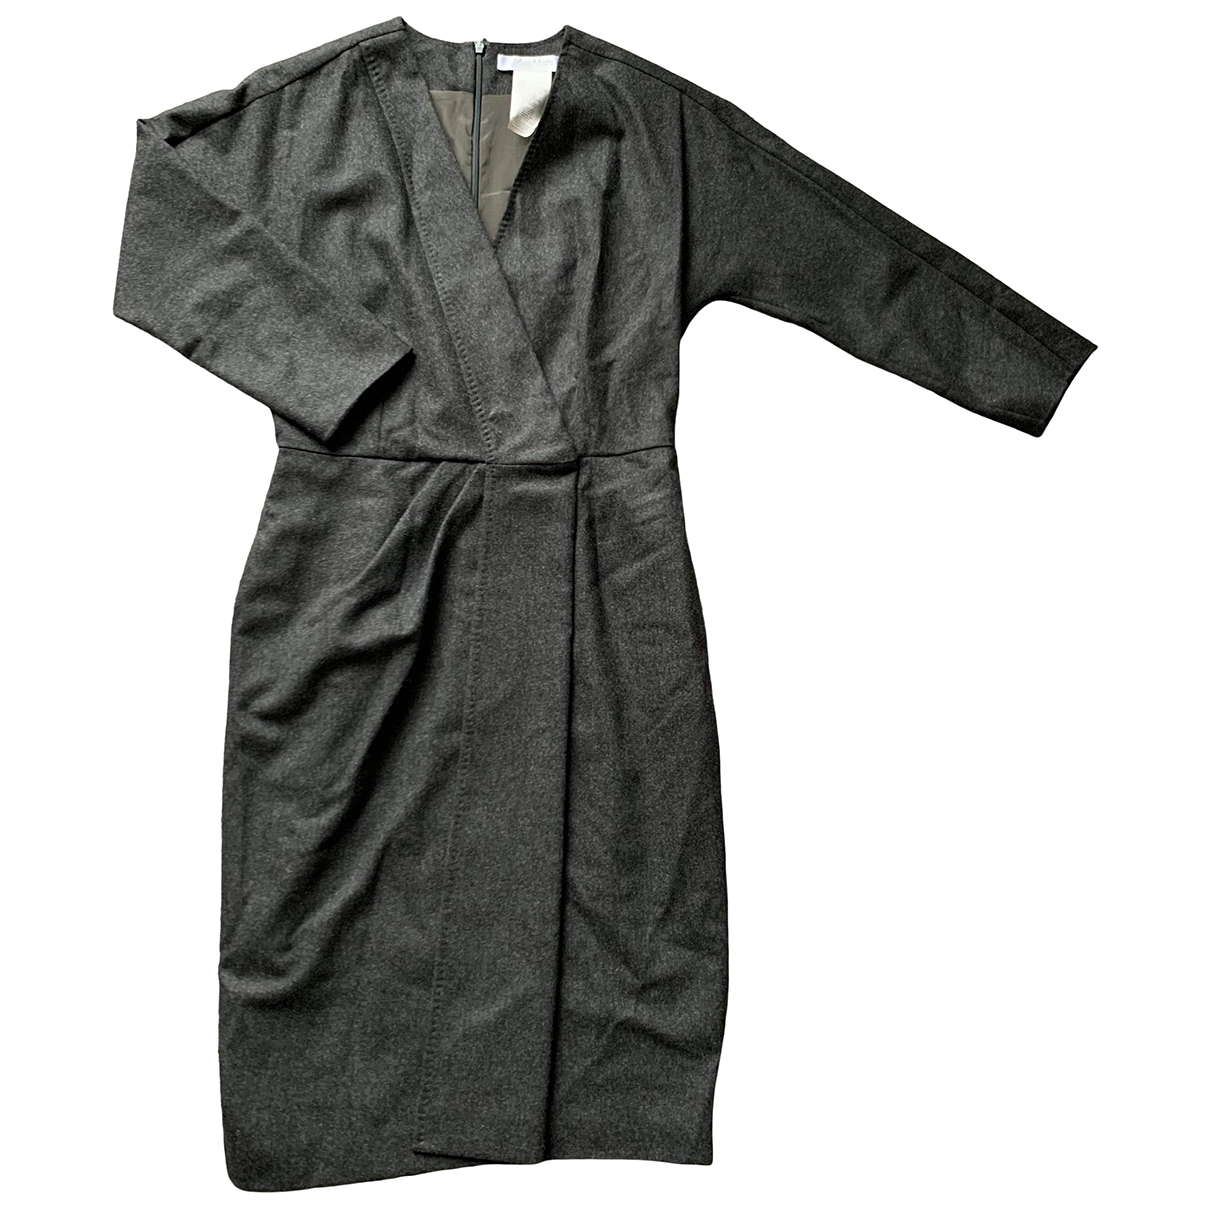 Max Mara \N Grey Wool dress for Women 42 IT